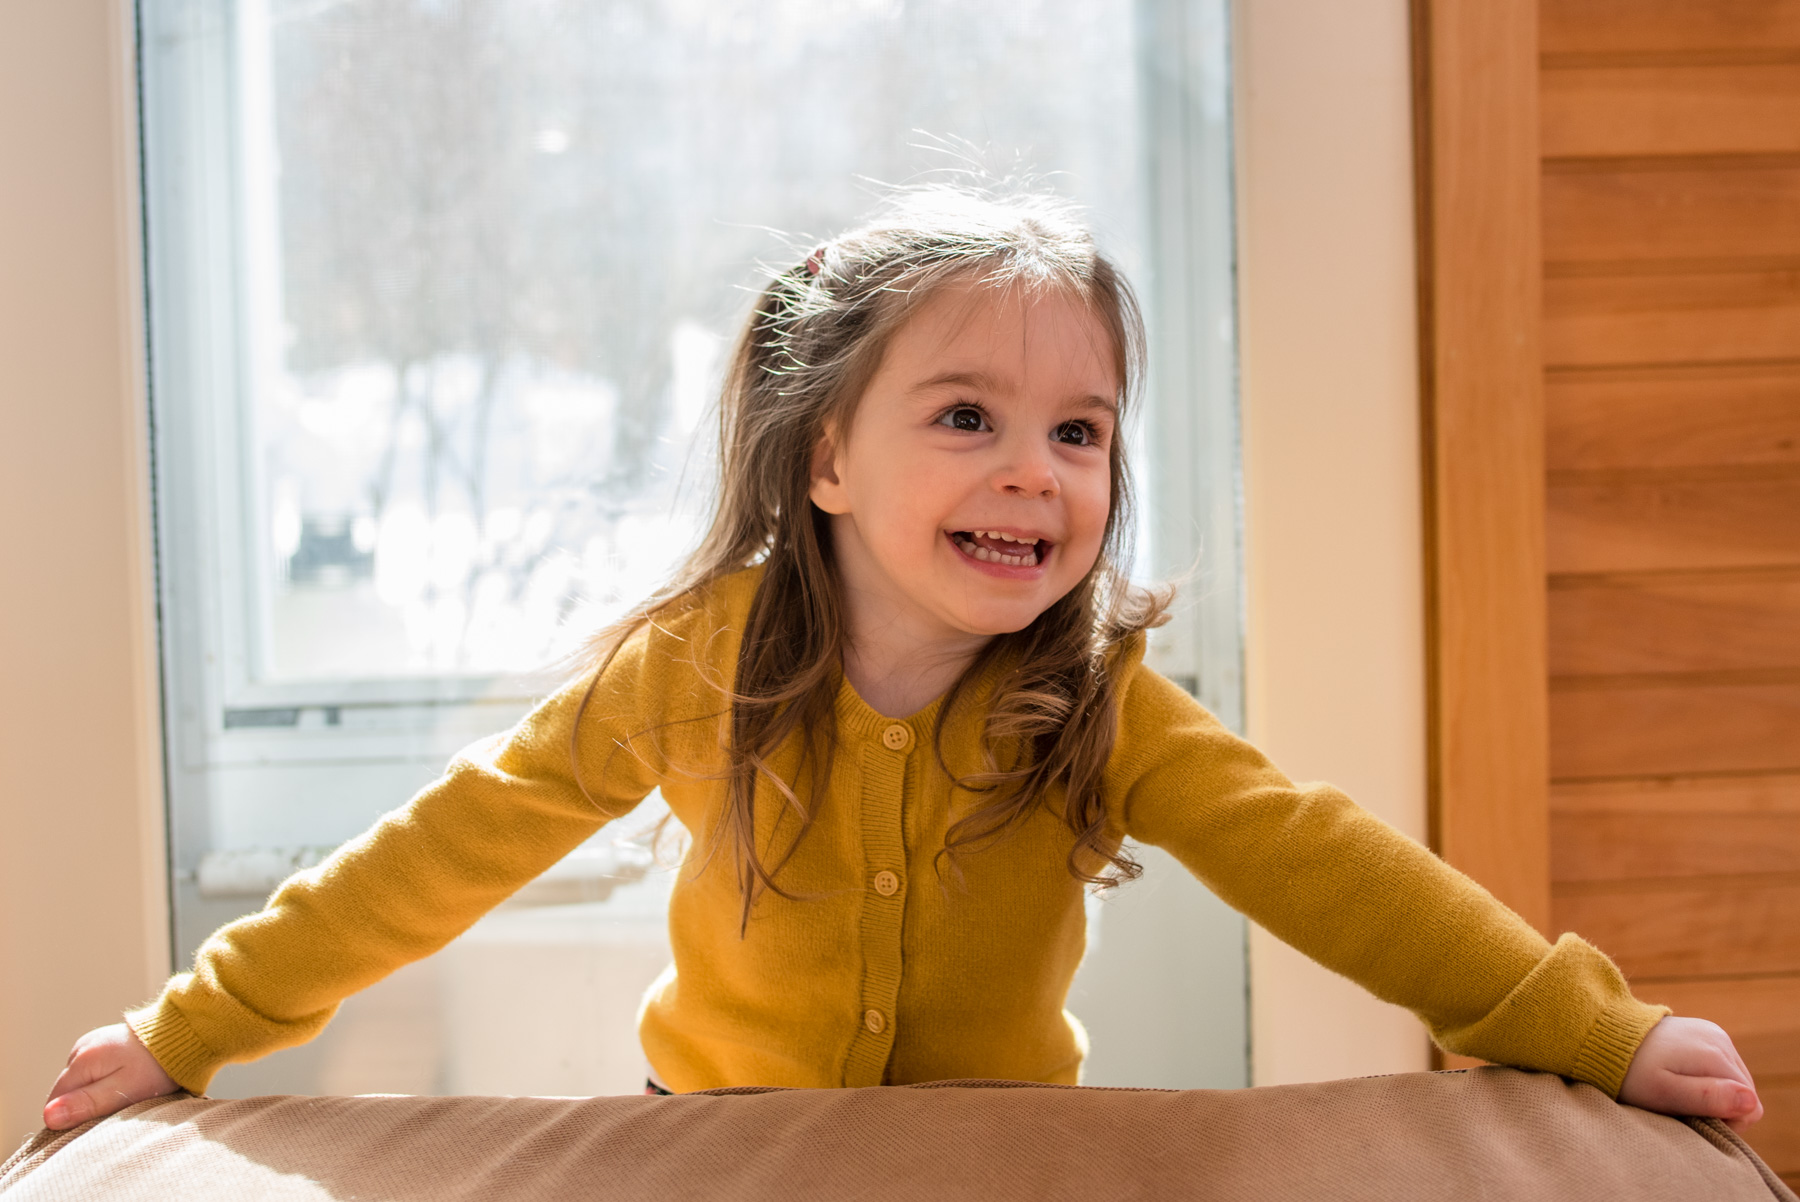 patienceclevelandphotography.familyphotography.Mkikds.2018-19